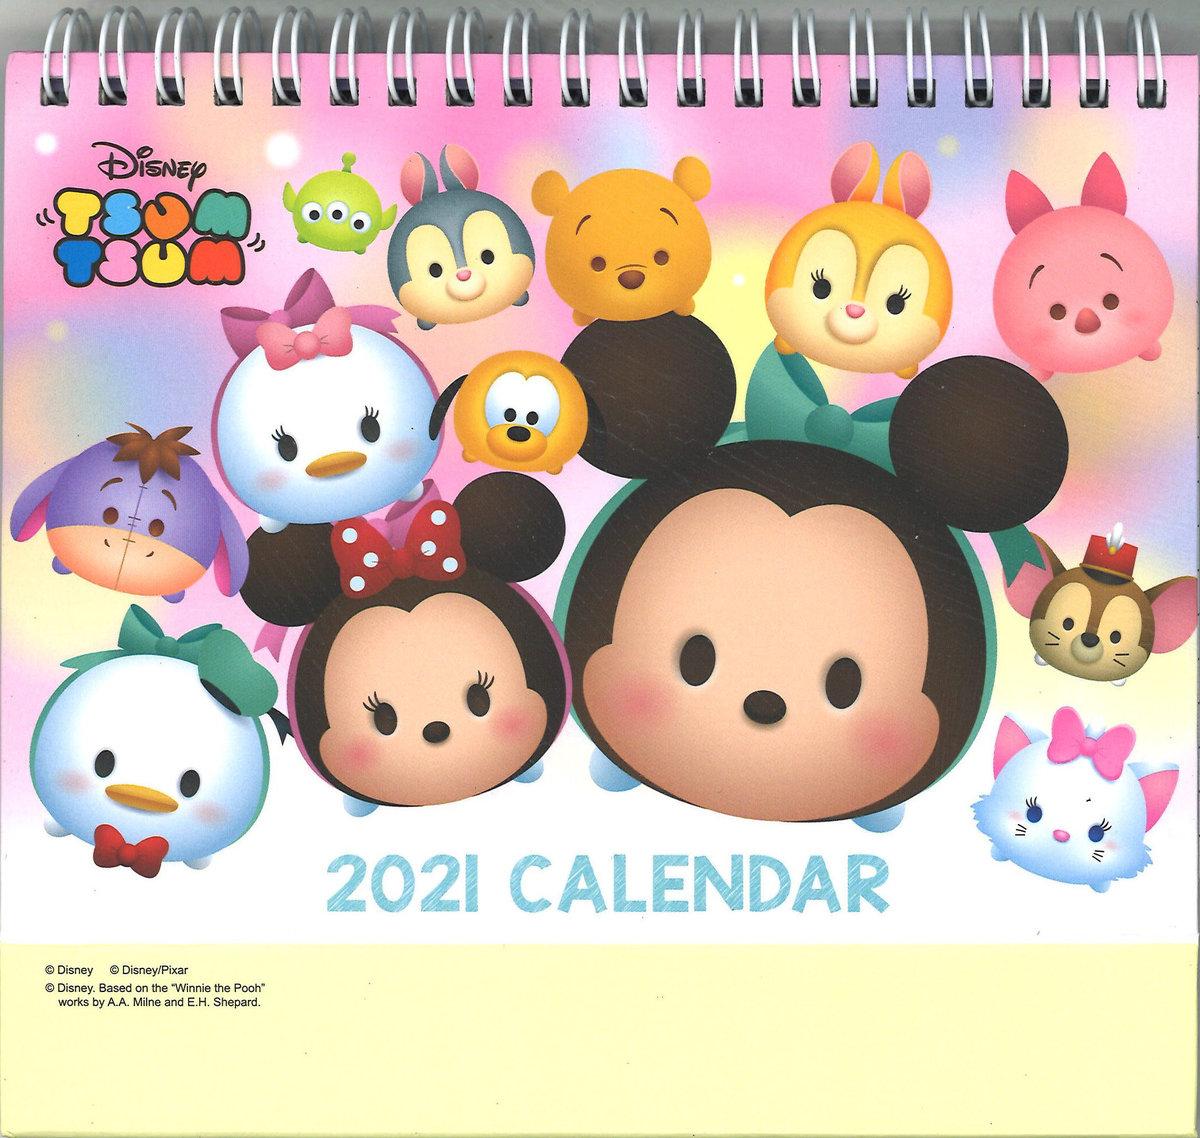 Tsum Tsum May 2021 Calendar   Huts Calendar